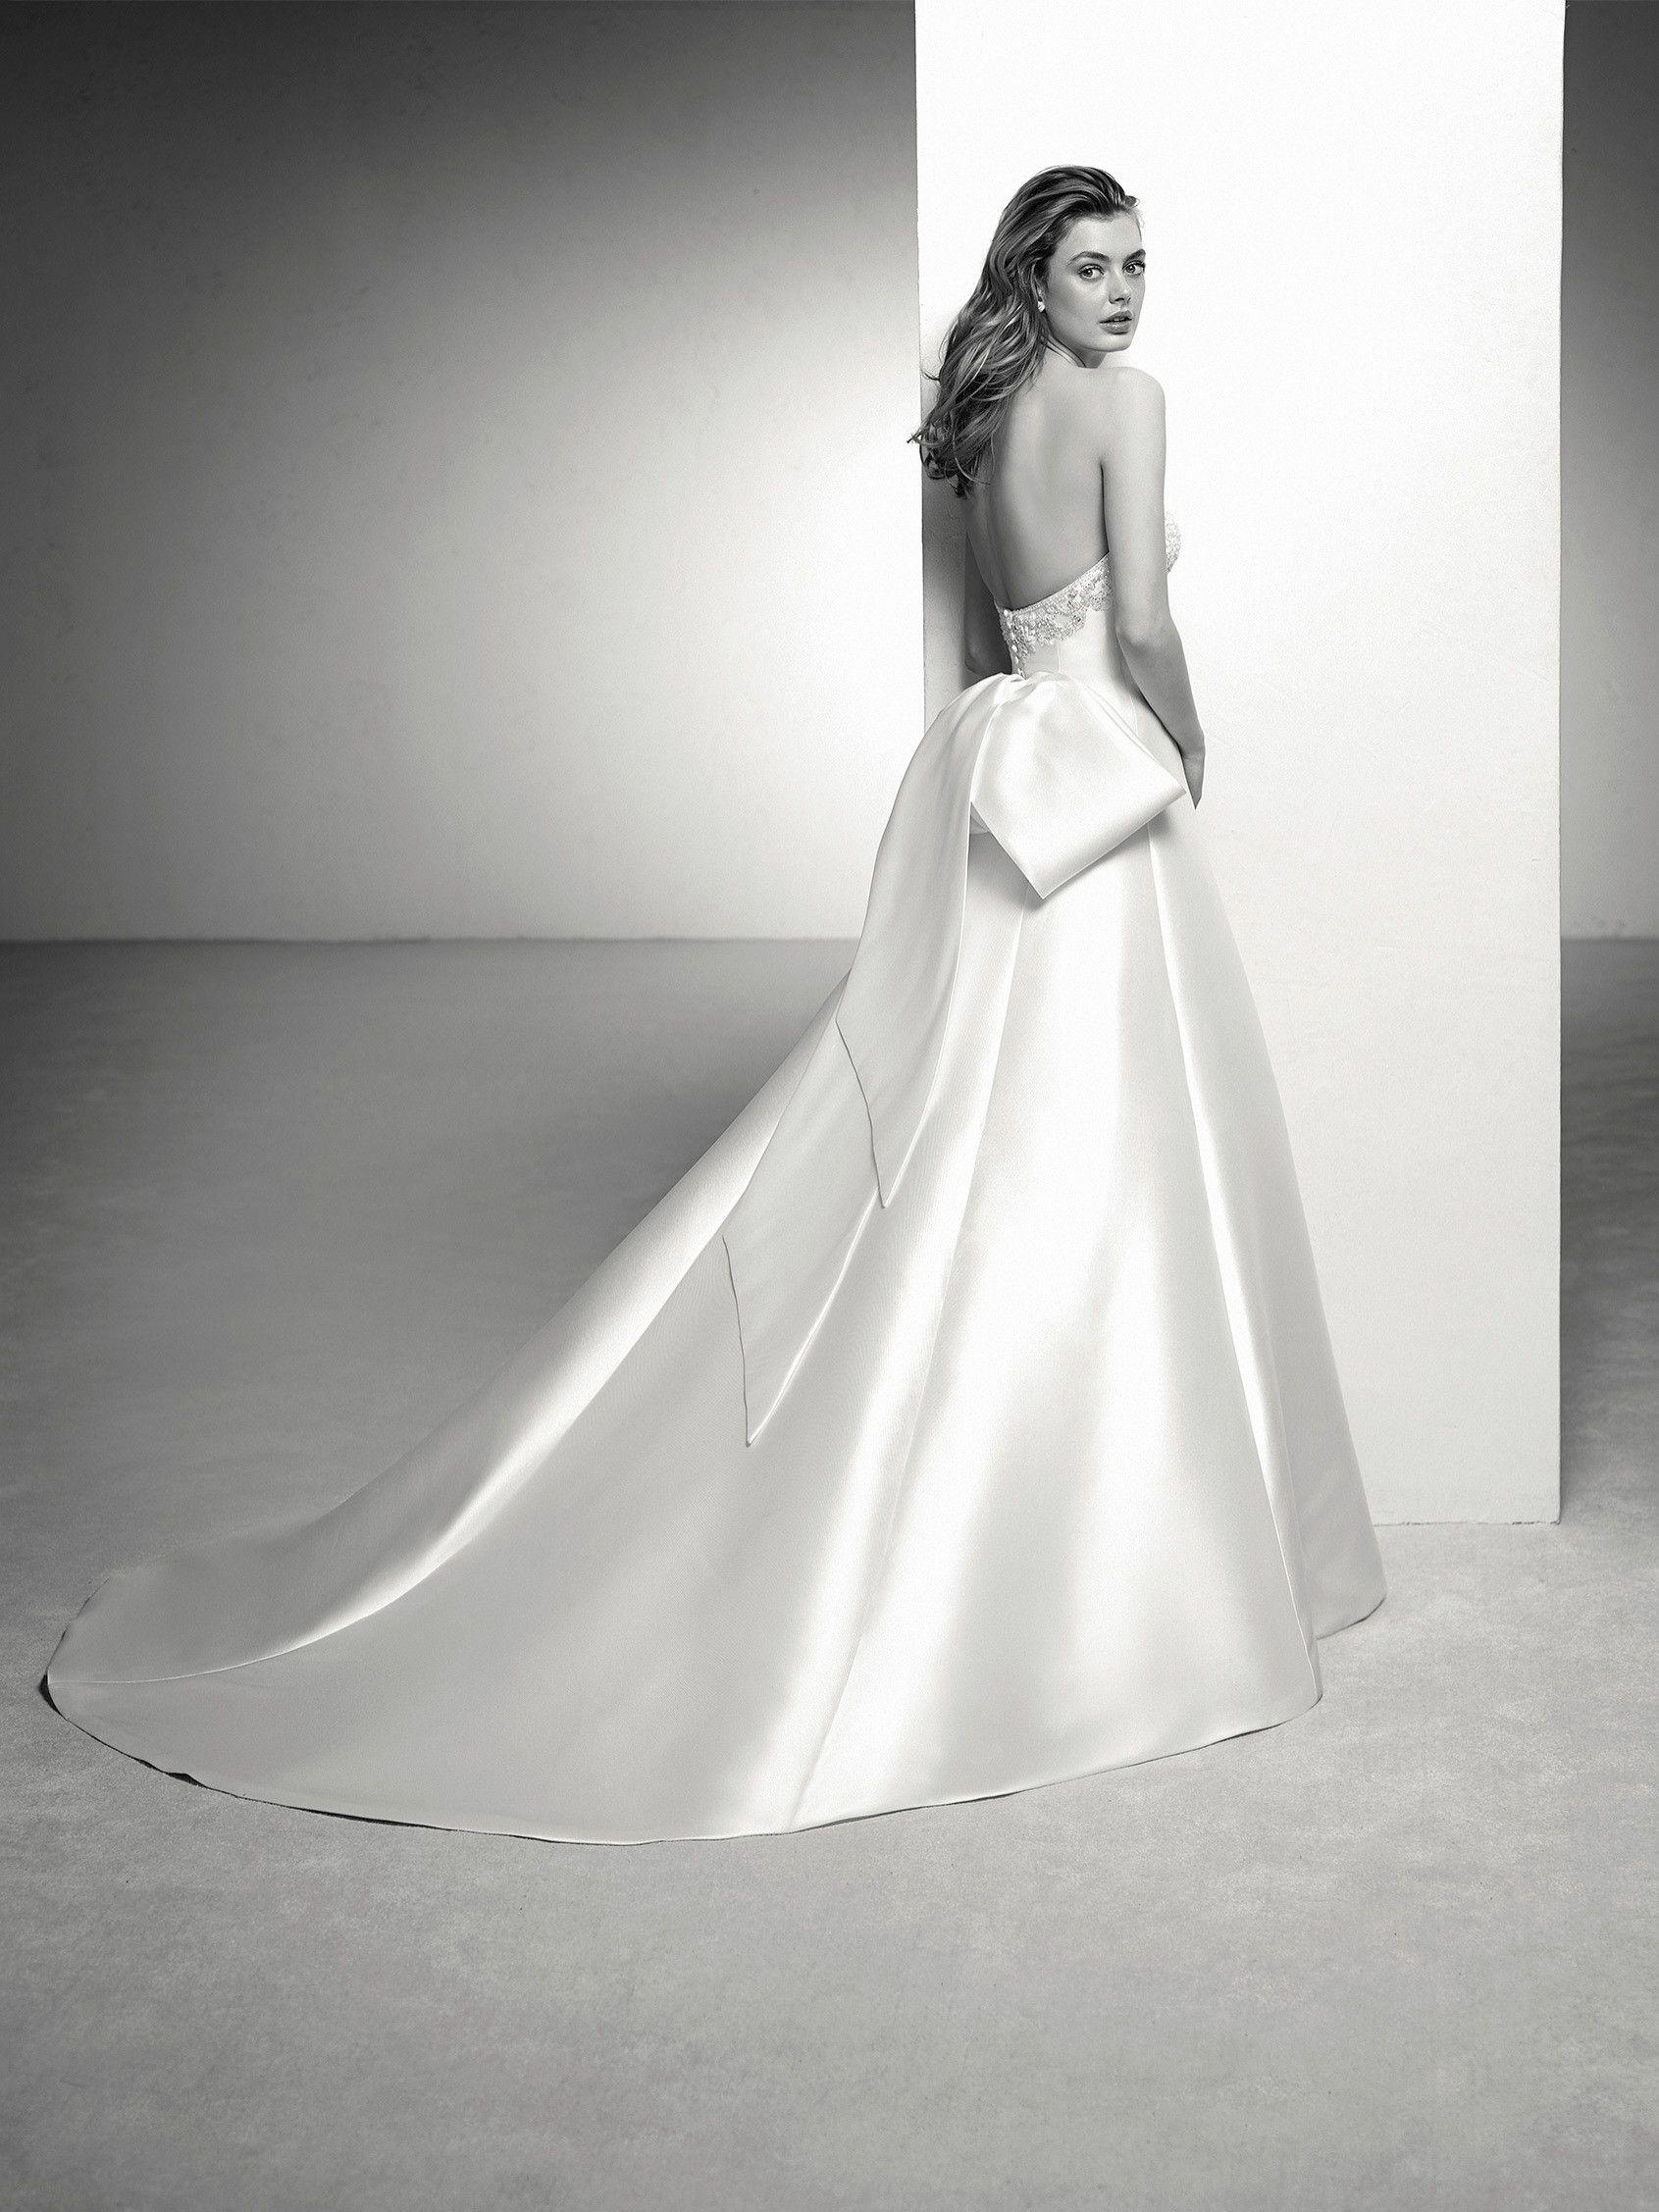 Wedding dresses bow back - Pronovias 2018 Collection | Wedding dress ...